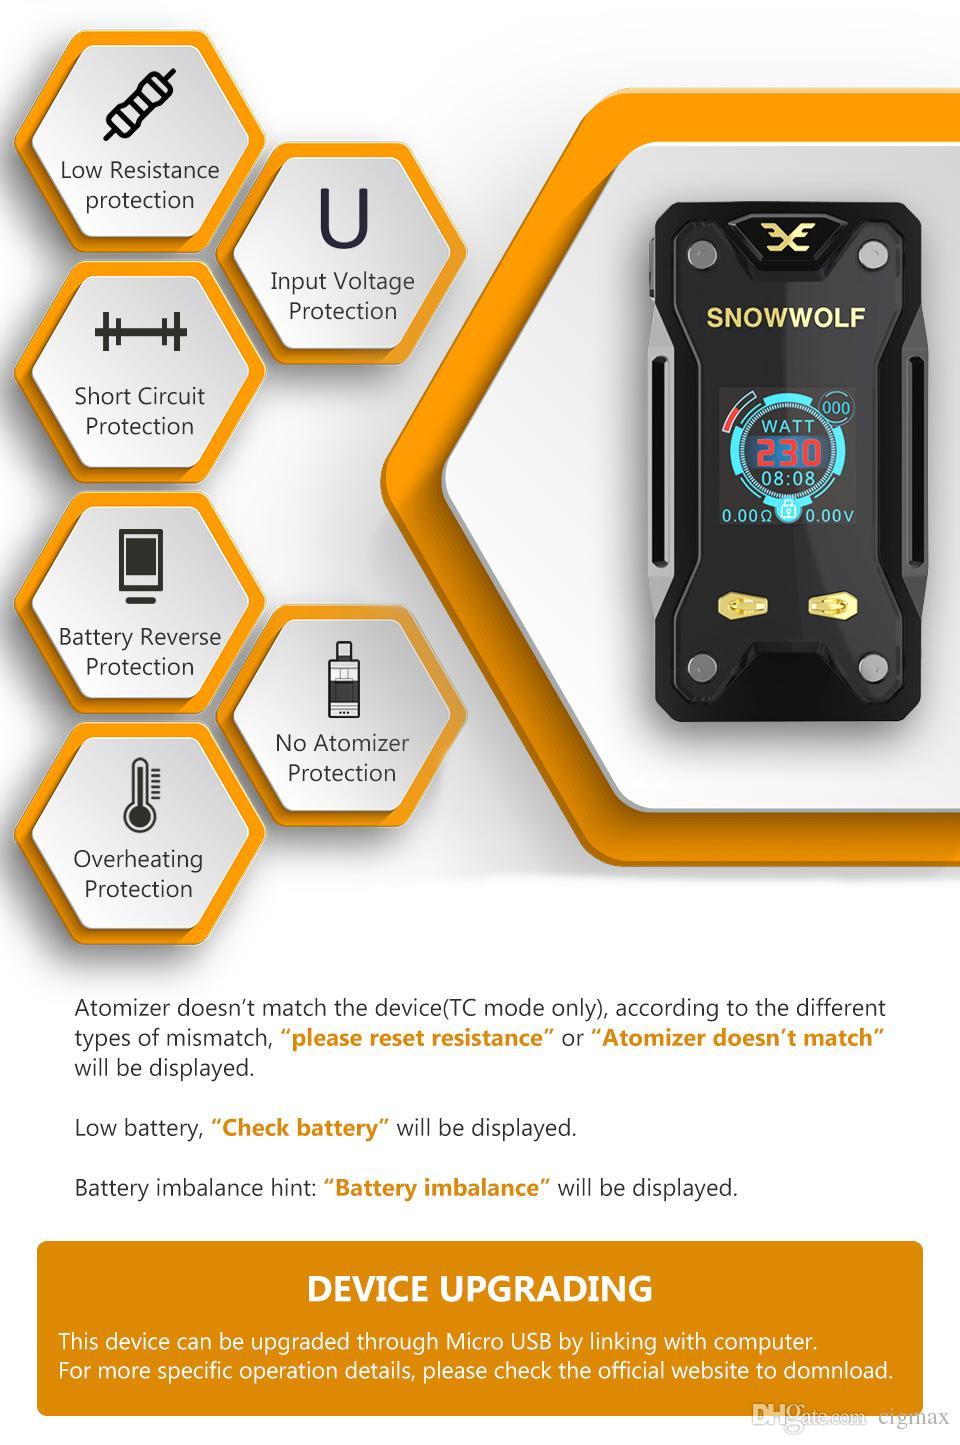 Sigaretta elettronica originale Snowwolf Xfeng 10W-230W TC Vape Box Mod 1.3 pollici TFT e battistrada 510 Sigelei Ecig No Batteria